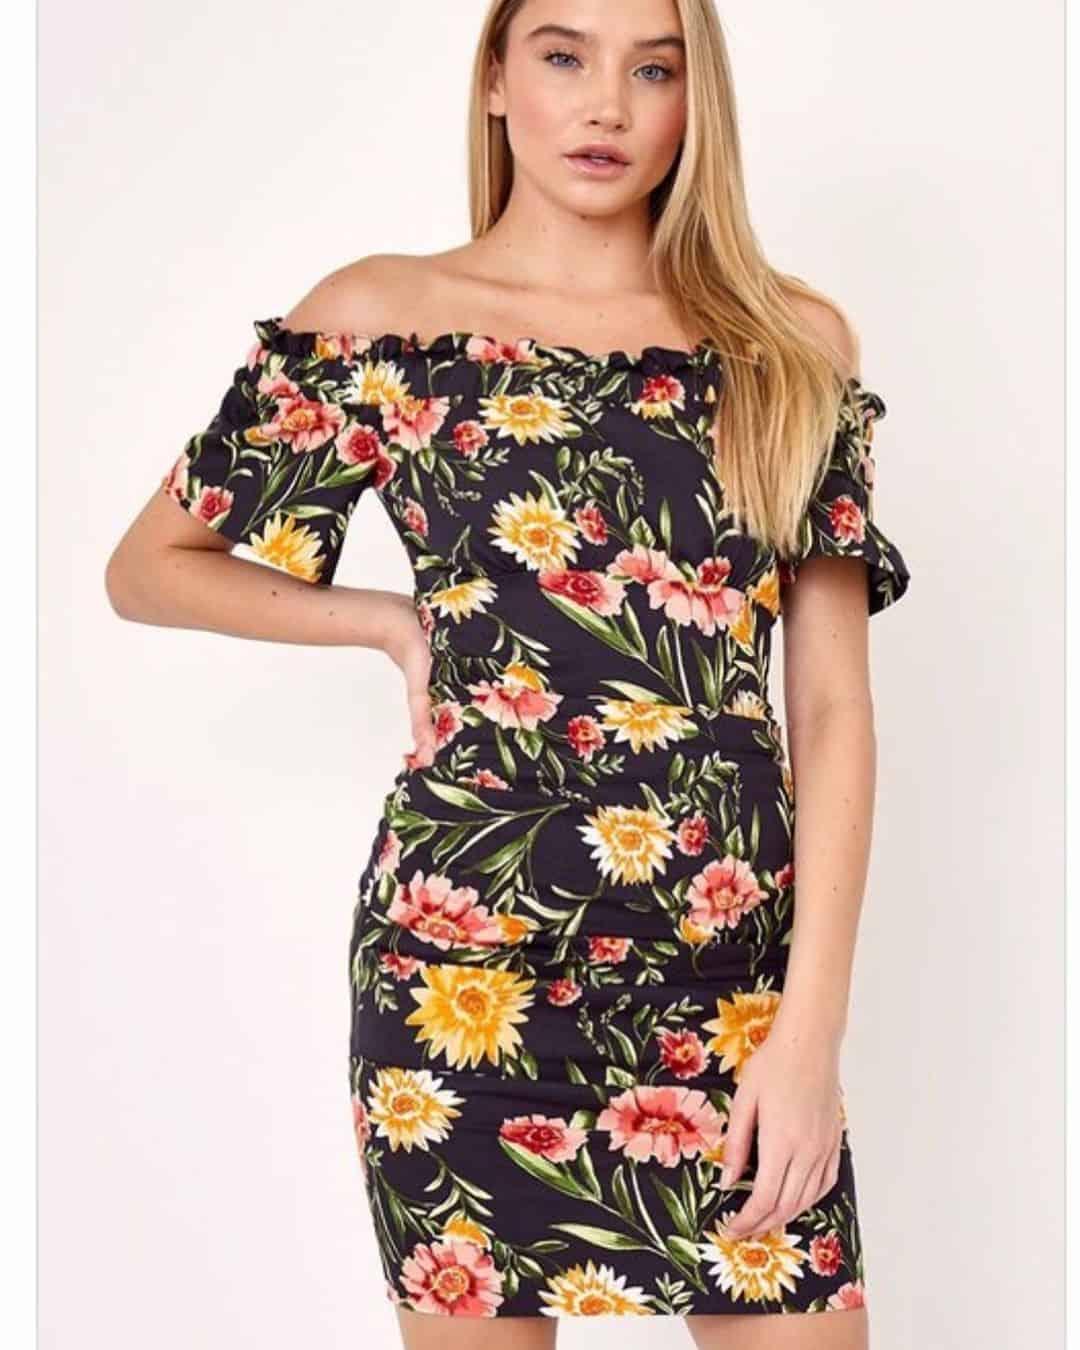 Floral prints on beach dresses 2020